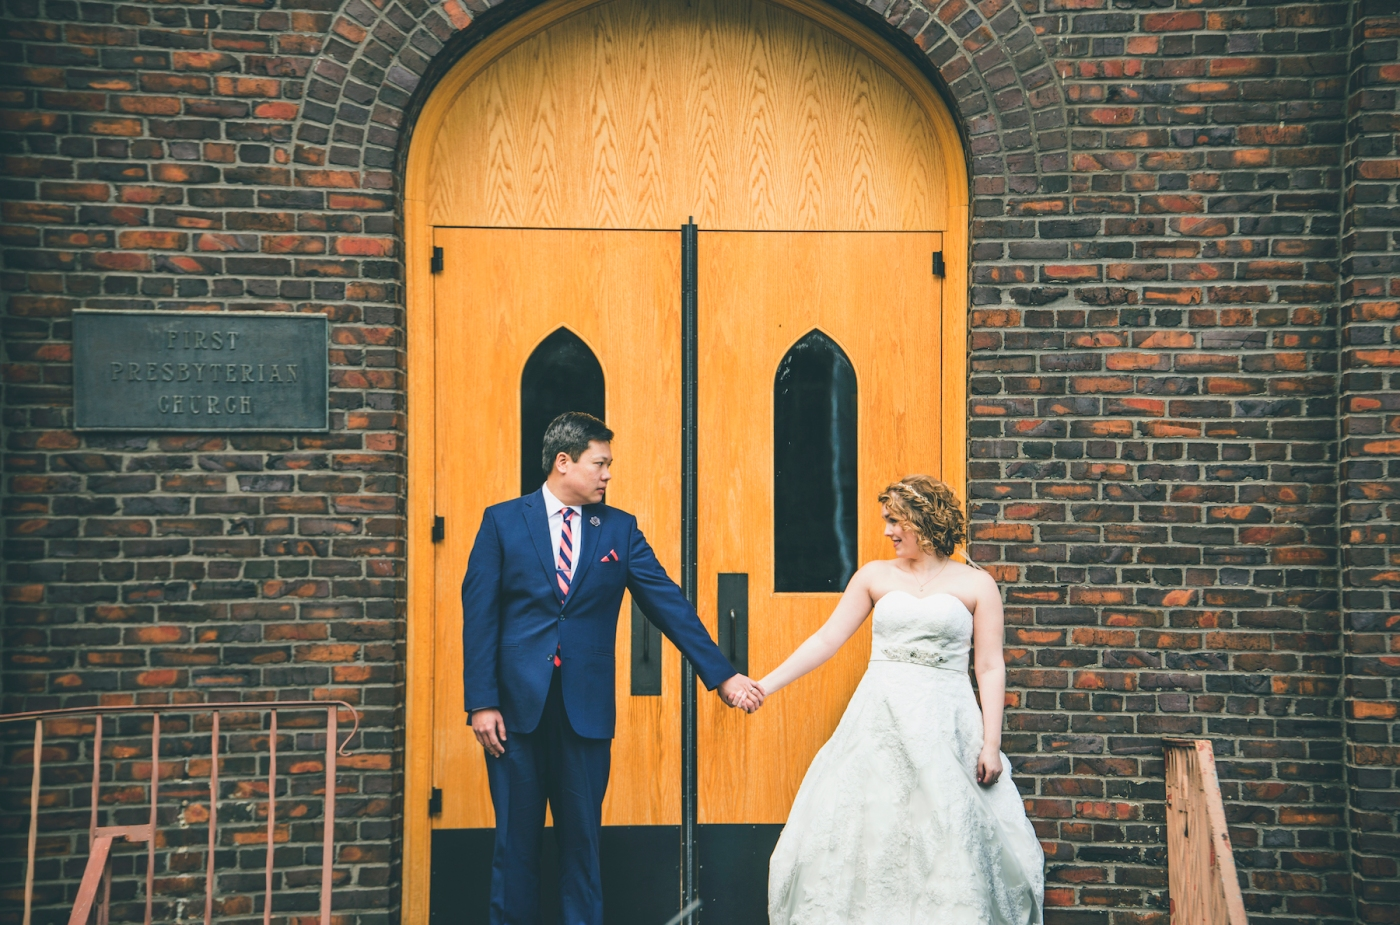 DSC_2212Everett_Wedding_Ballroom_Jane_Speleers_photography_Rachel_and_Edmund_Bridesmaids_peach_dresses_groomsmen_2017